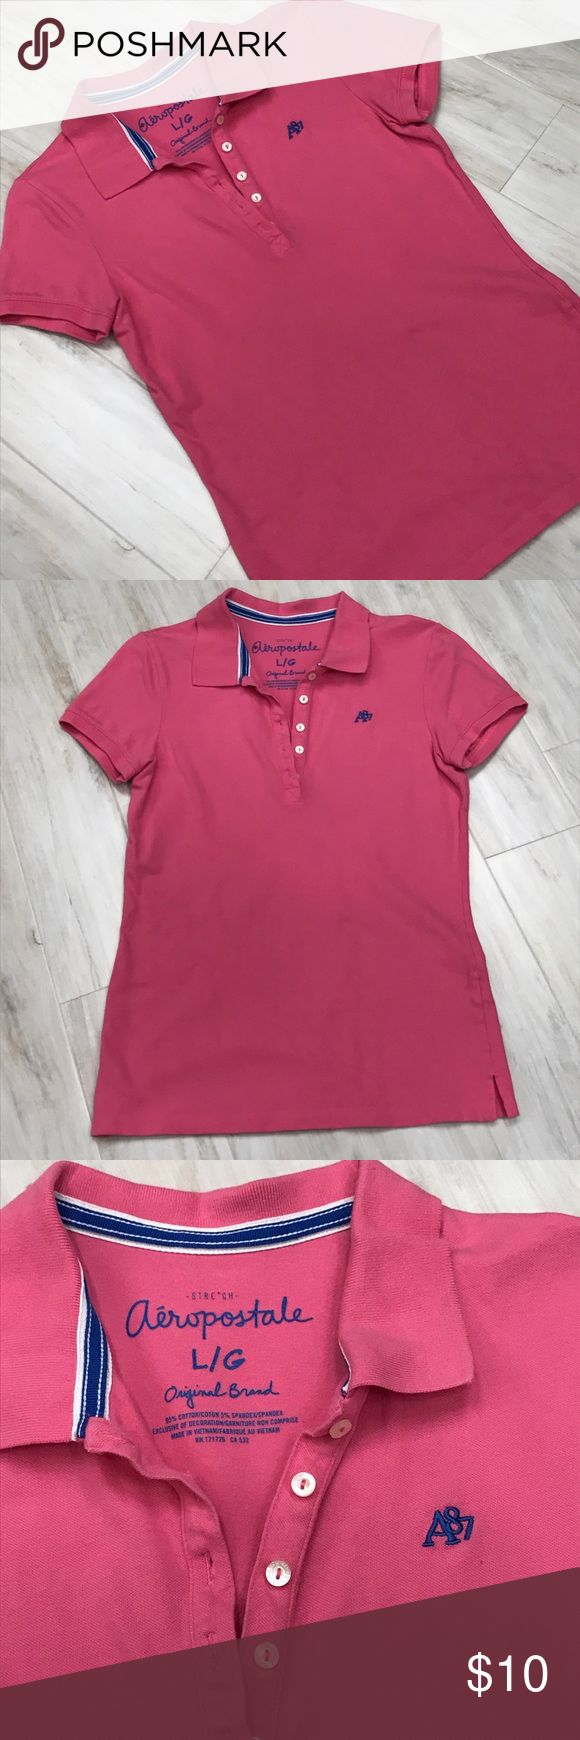 Aeropostale pink polo shirt Pink polo shirt Aeropostale Tops Tees - Short Sleeve